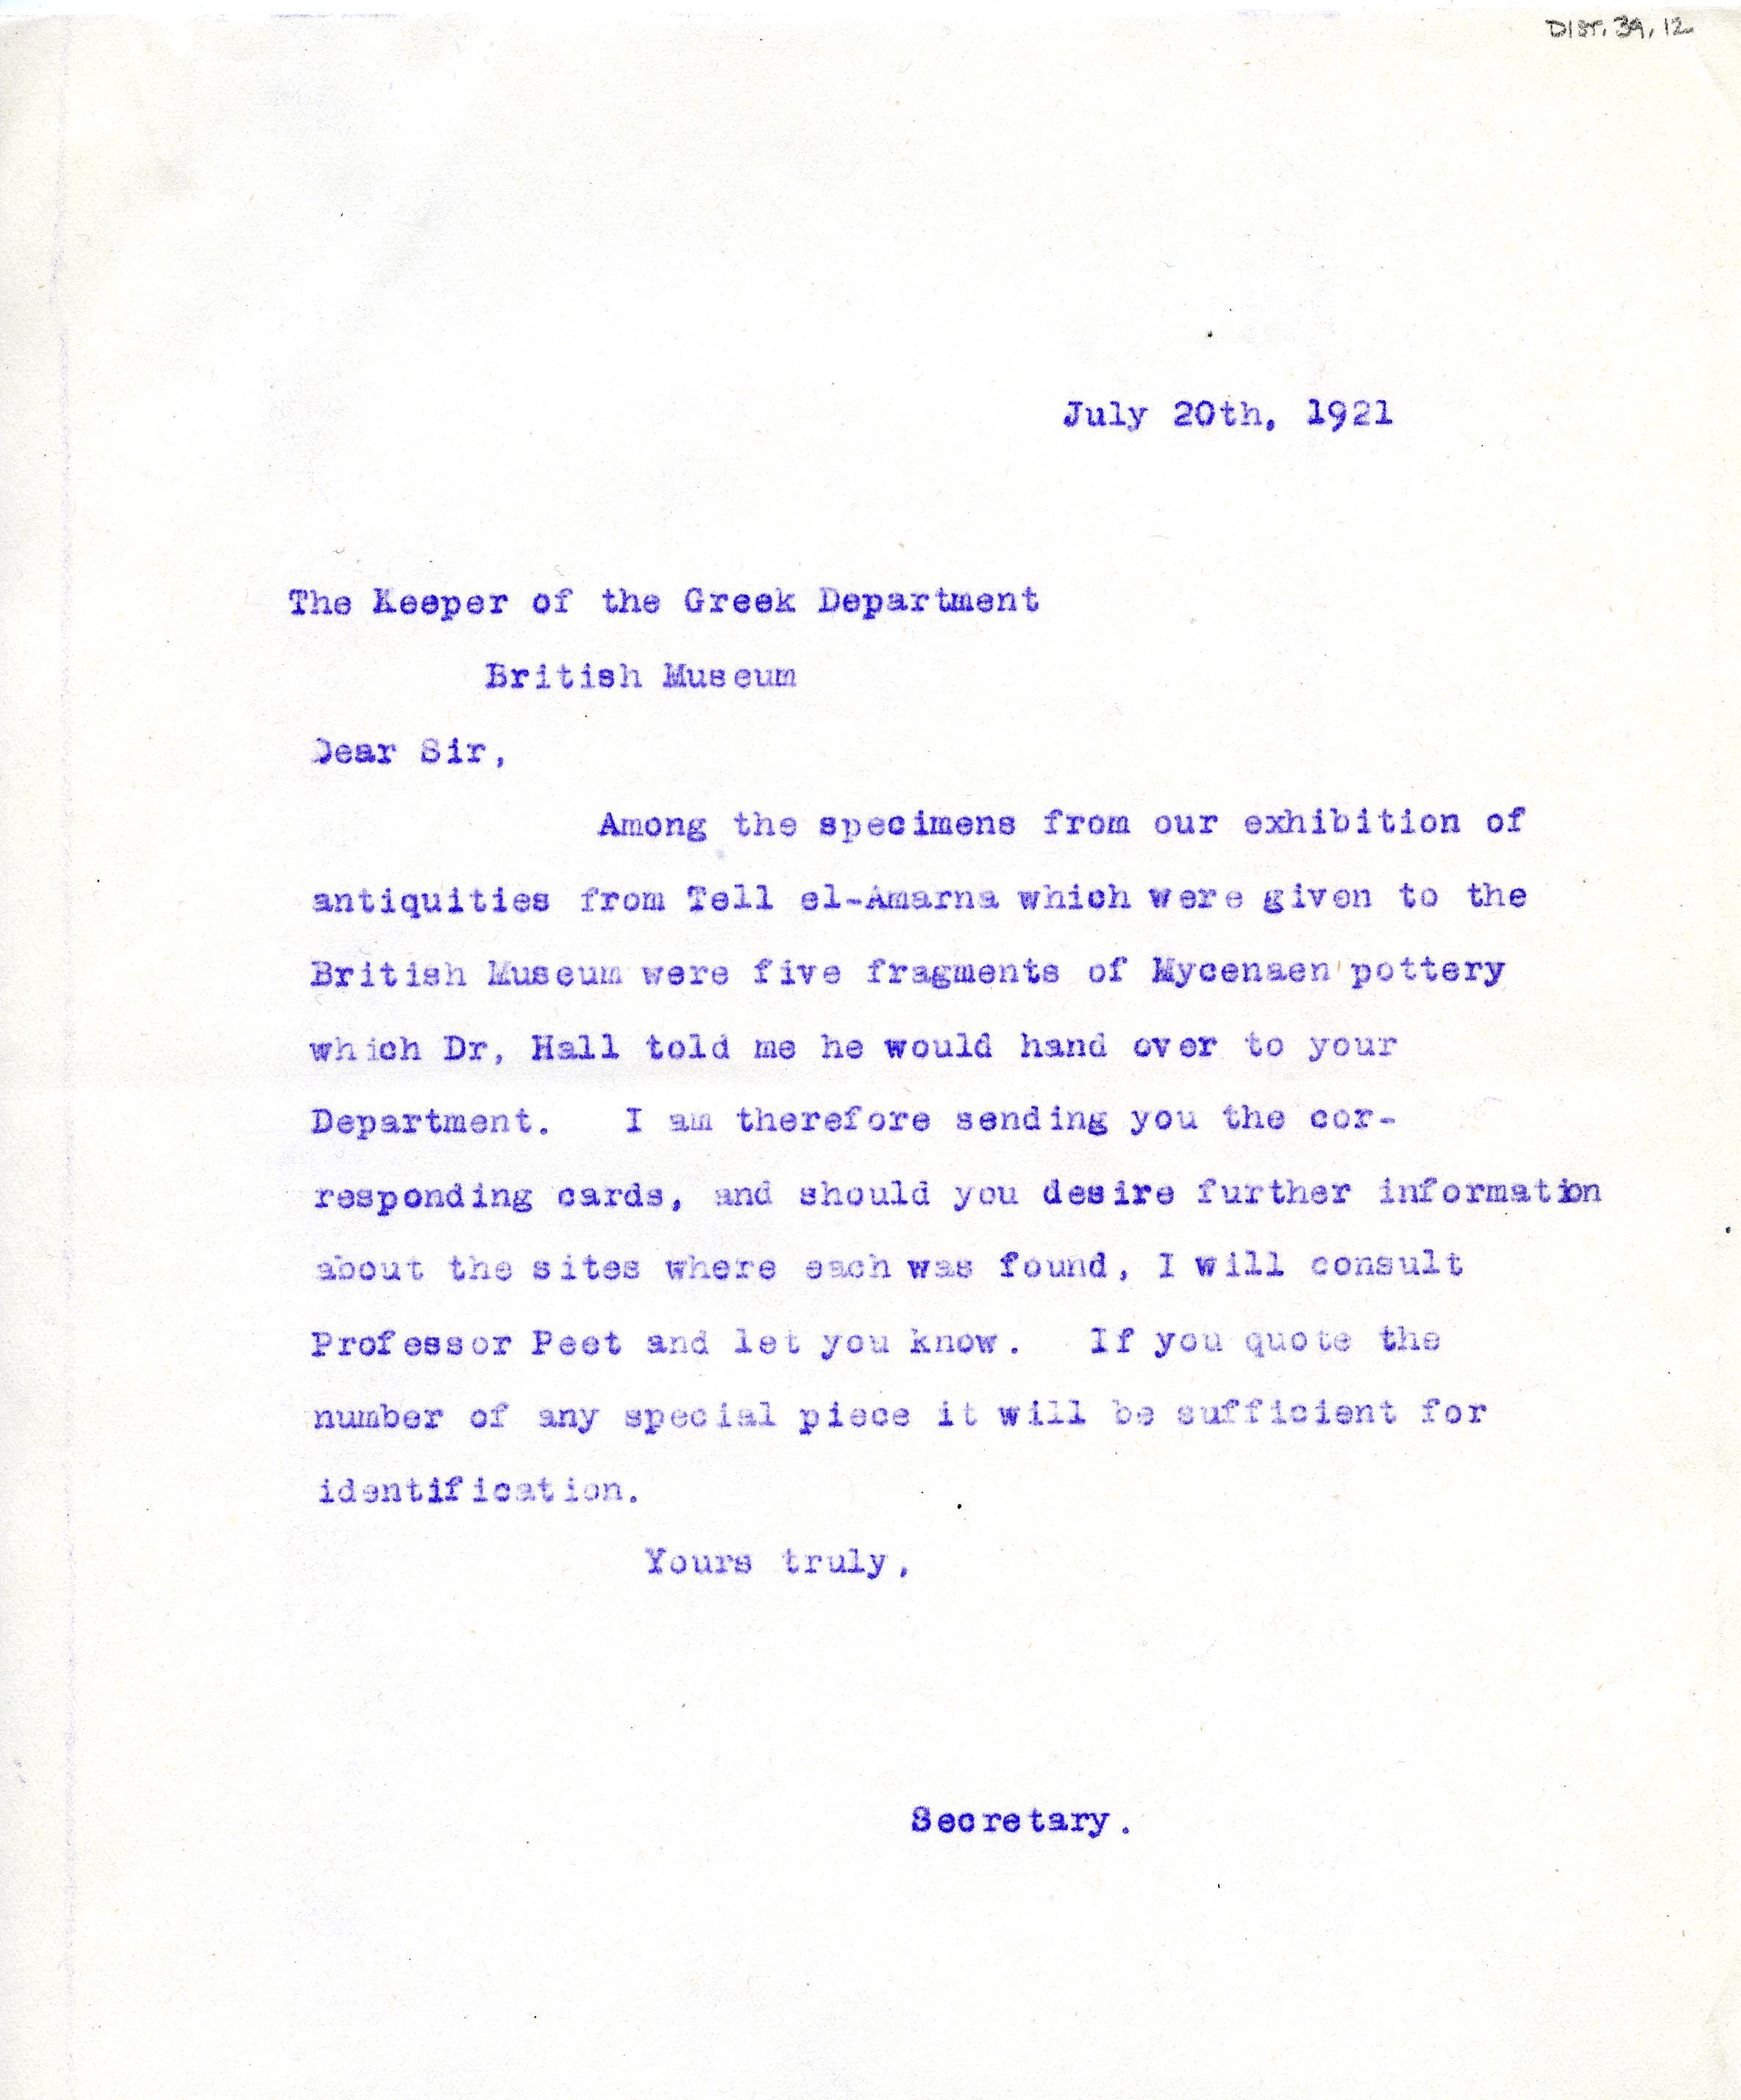 1921-22 Tell el-Amarna DIST.39.12